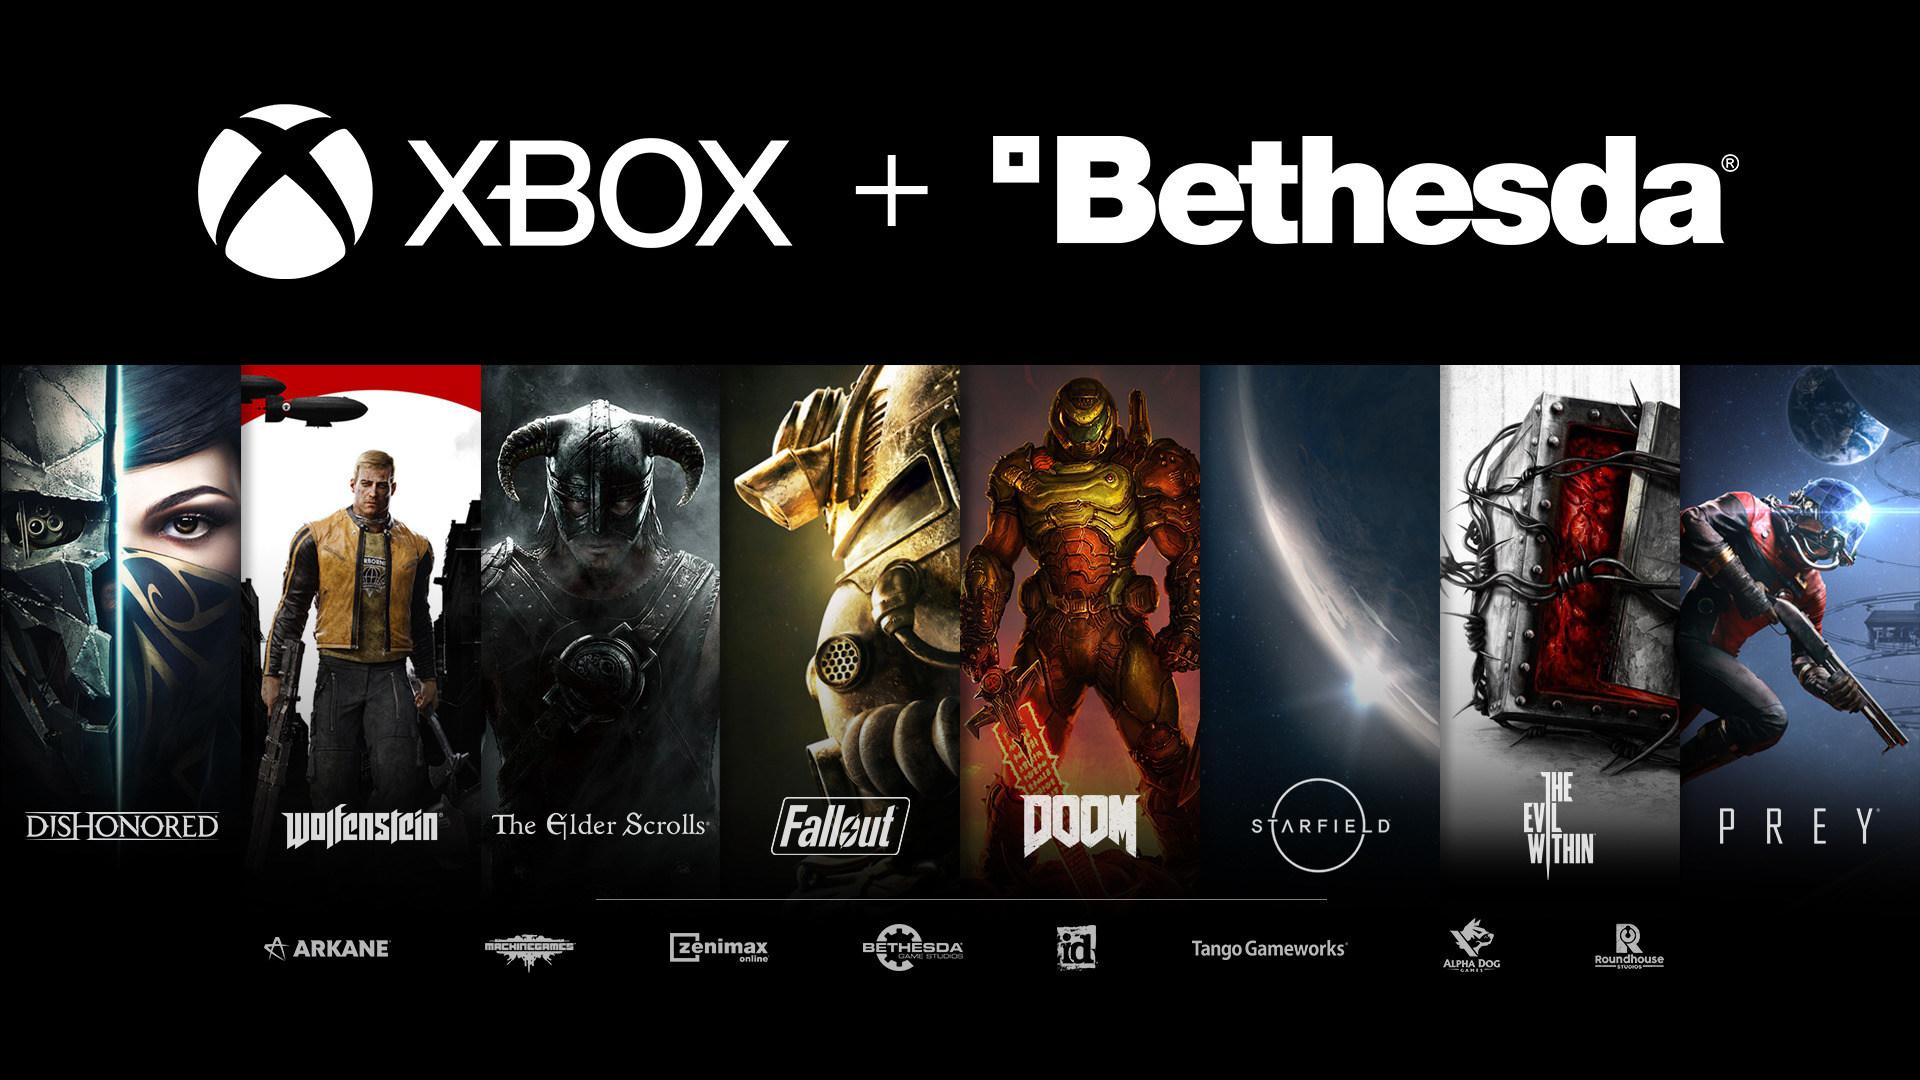 Microsoft, Xbox, übernahme, Bethesda, Doom, Fallout, Quake, Zenimax